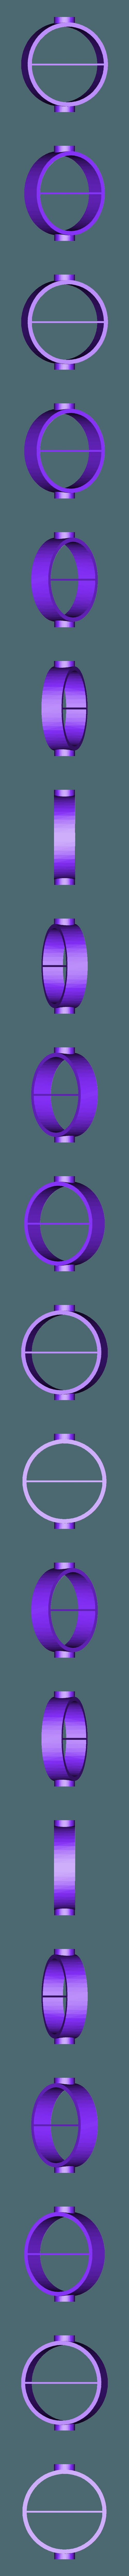 Ninjaflex1.STL Download free STL file Printed truck V1: Springs • 3D print template, MrCrankyface